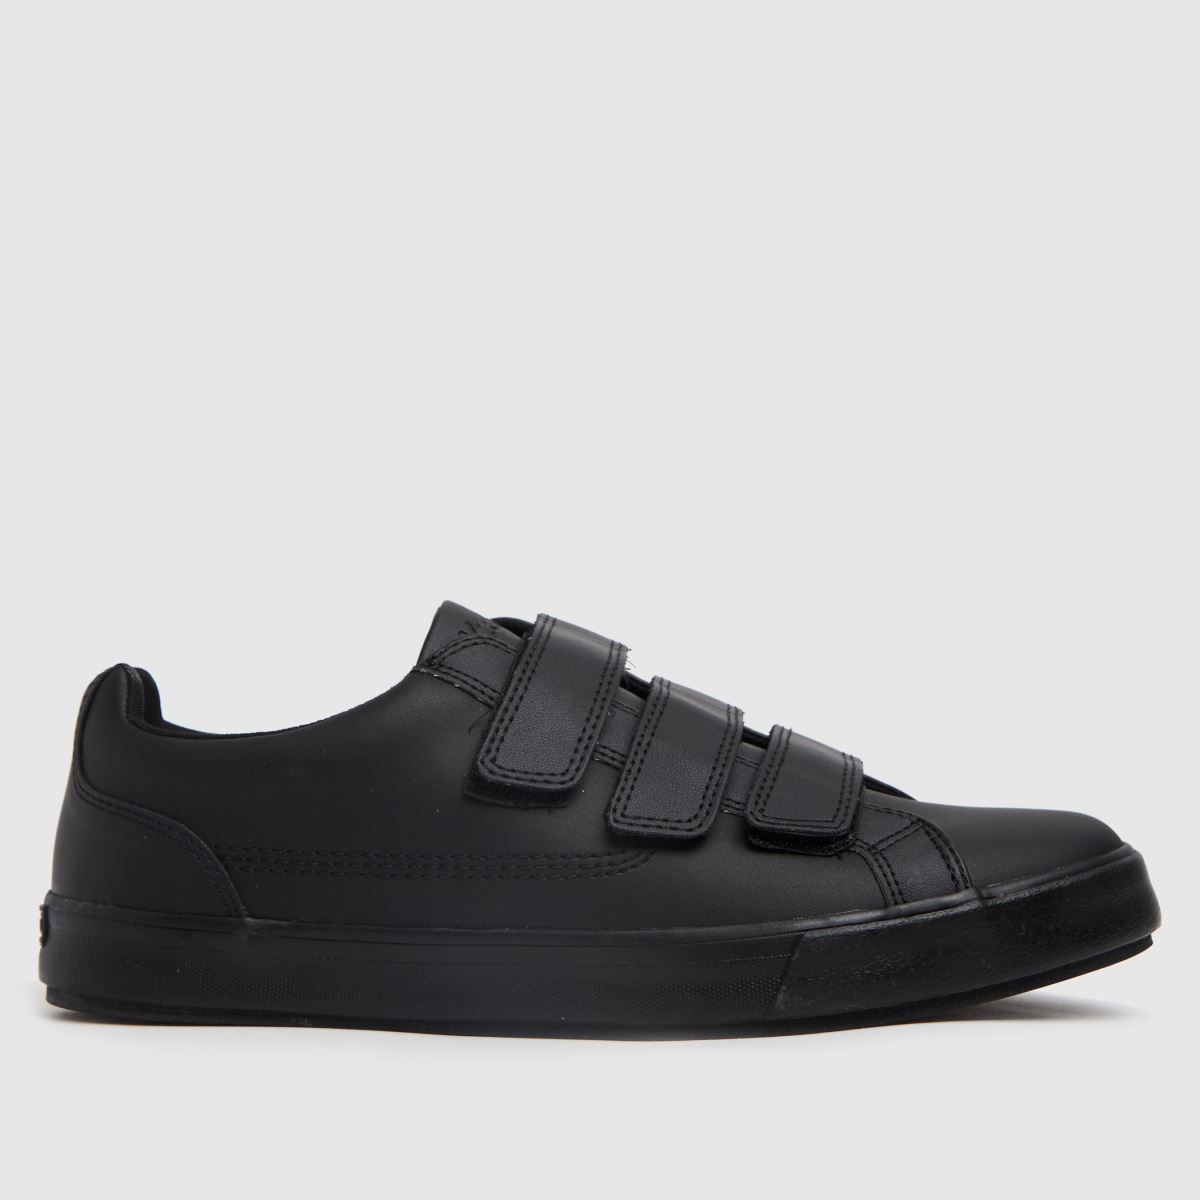 Kickers Black Tovni Trip Shoes